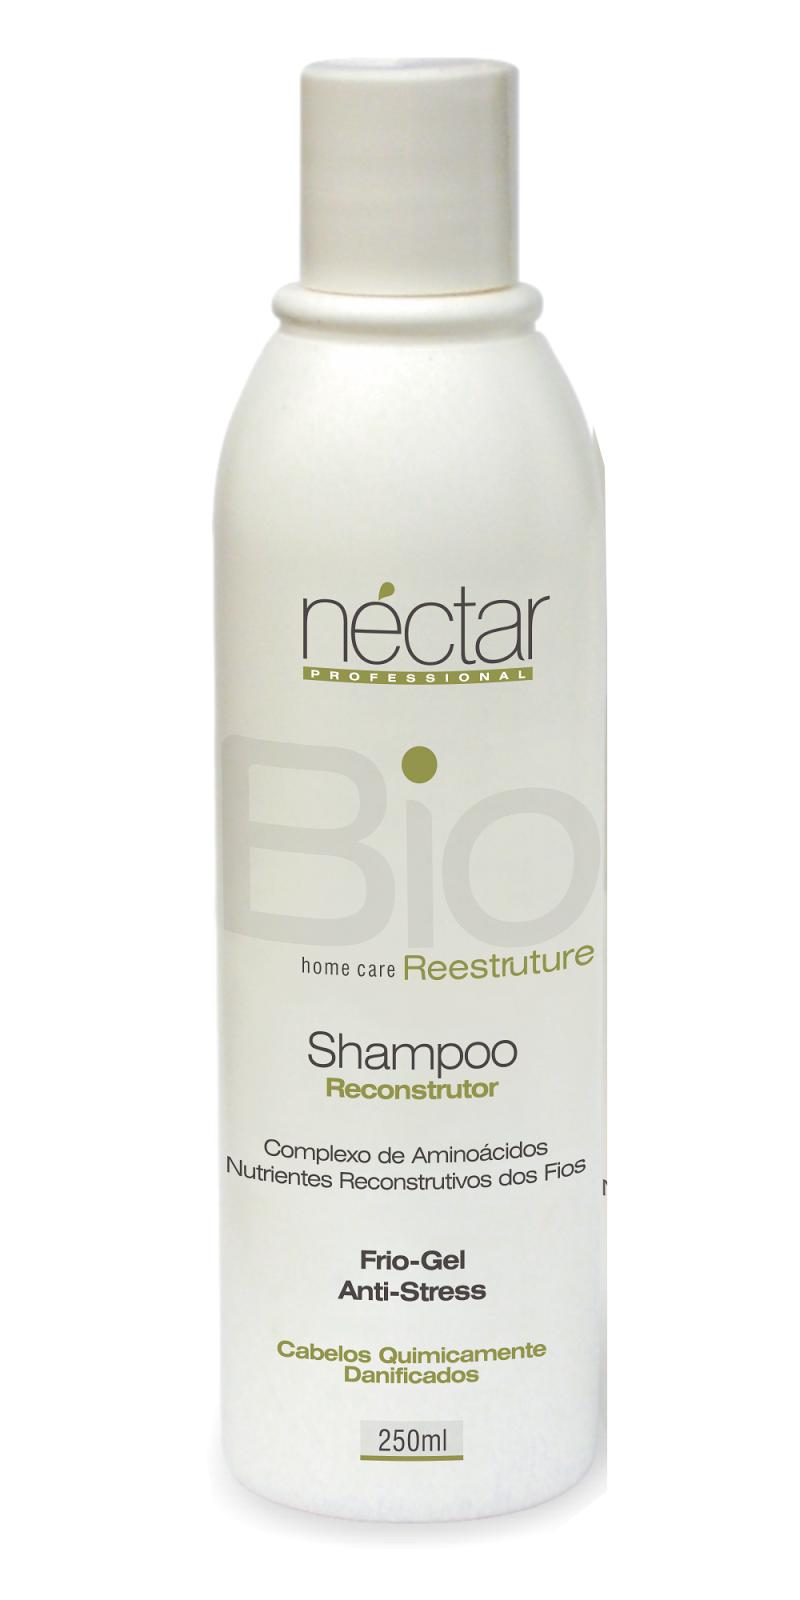 Shampoo reconstrutor  Néctar